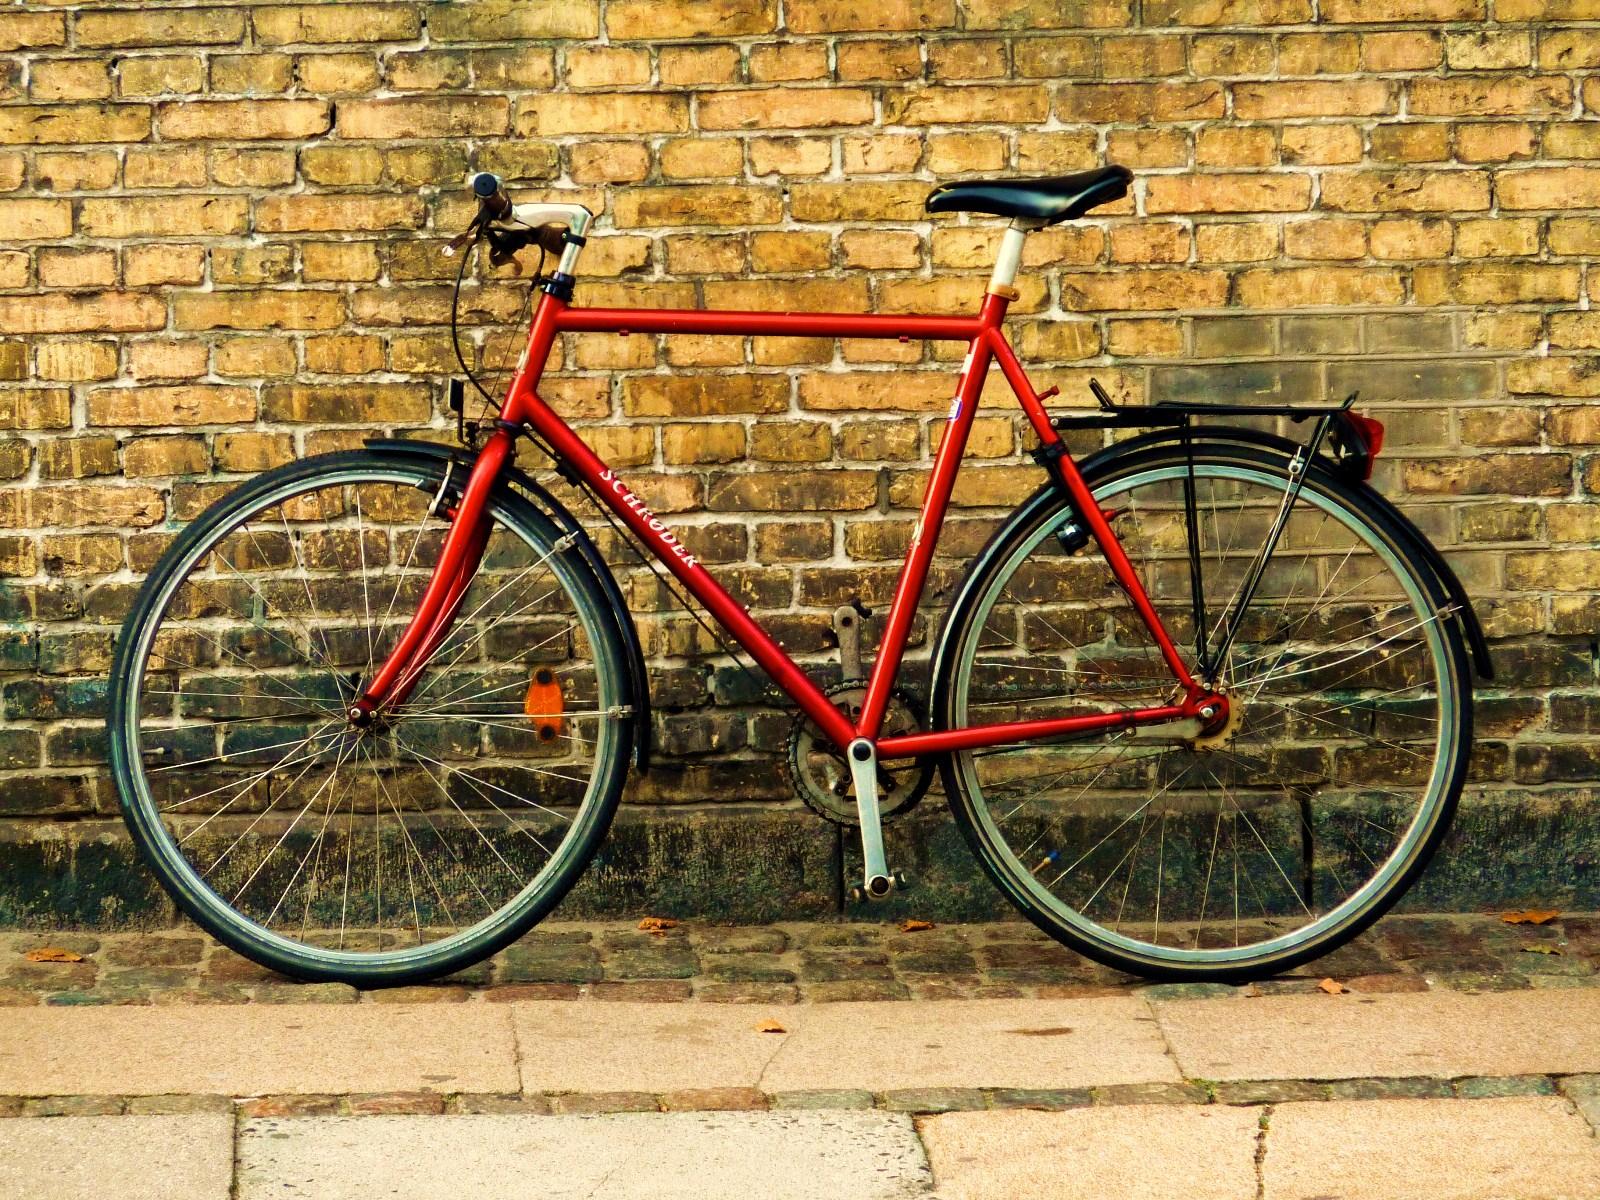 Тюнинг велосипеда украина своими руками фото